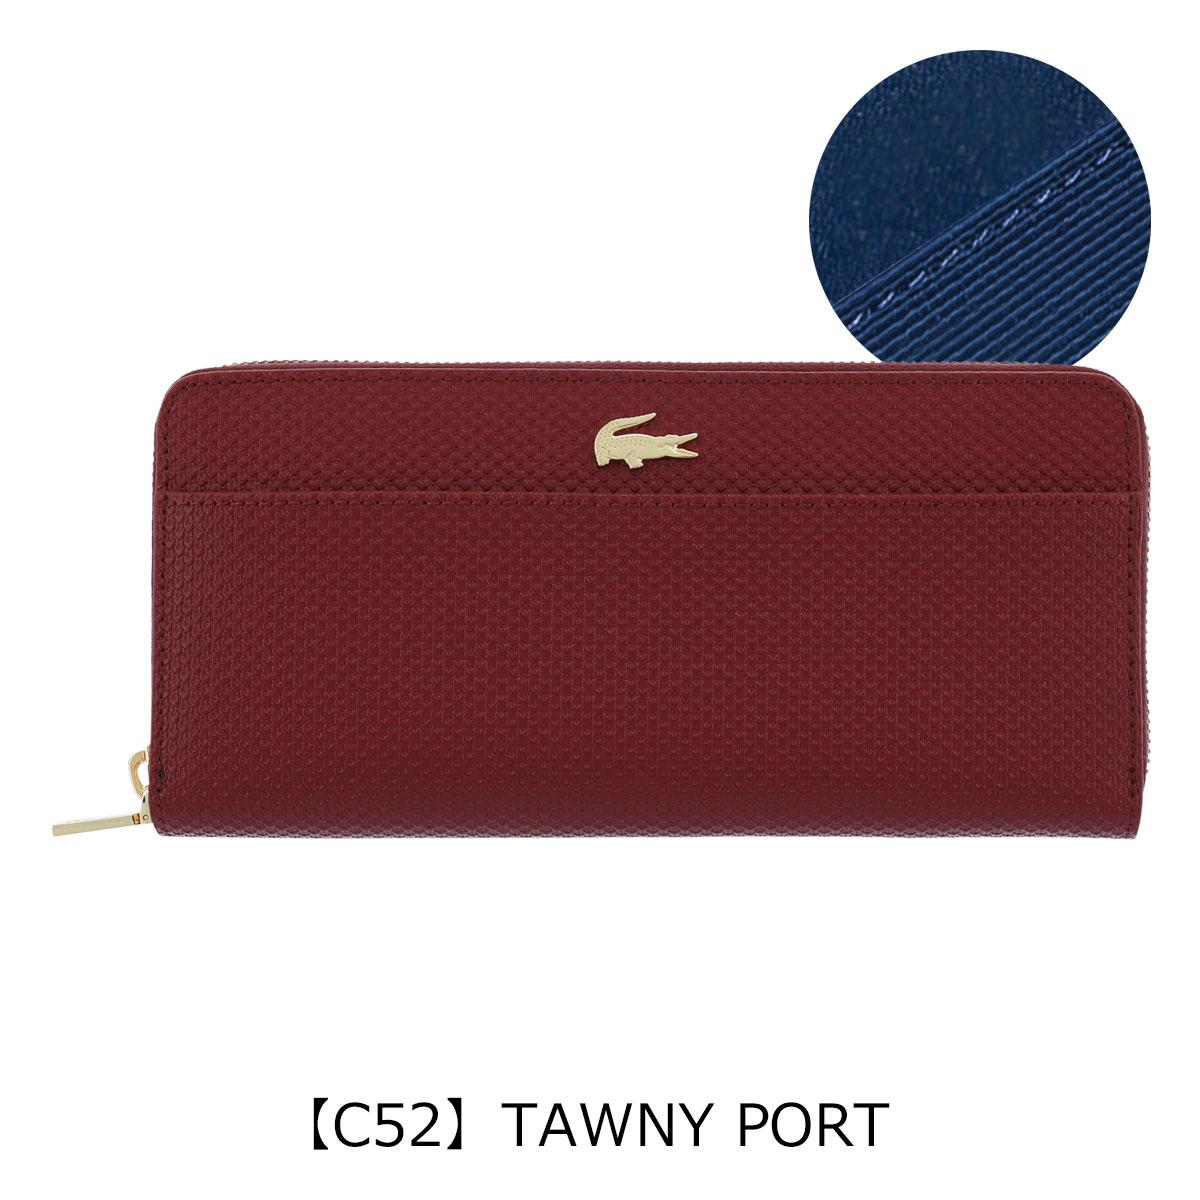 【C52】TAWNY PORT